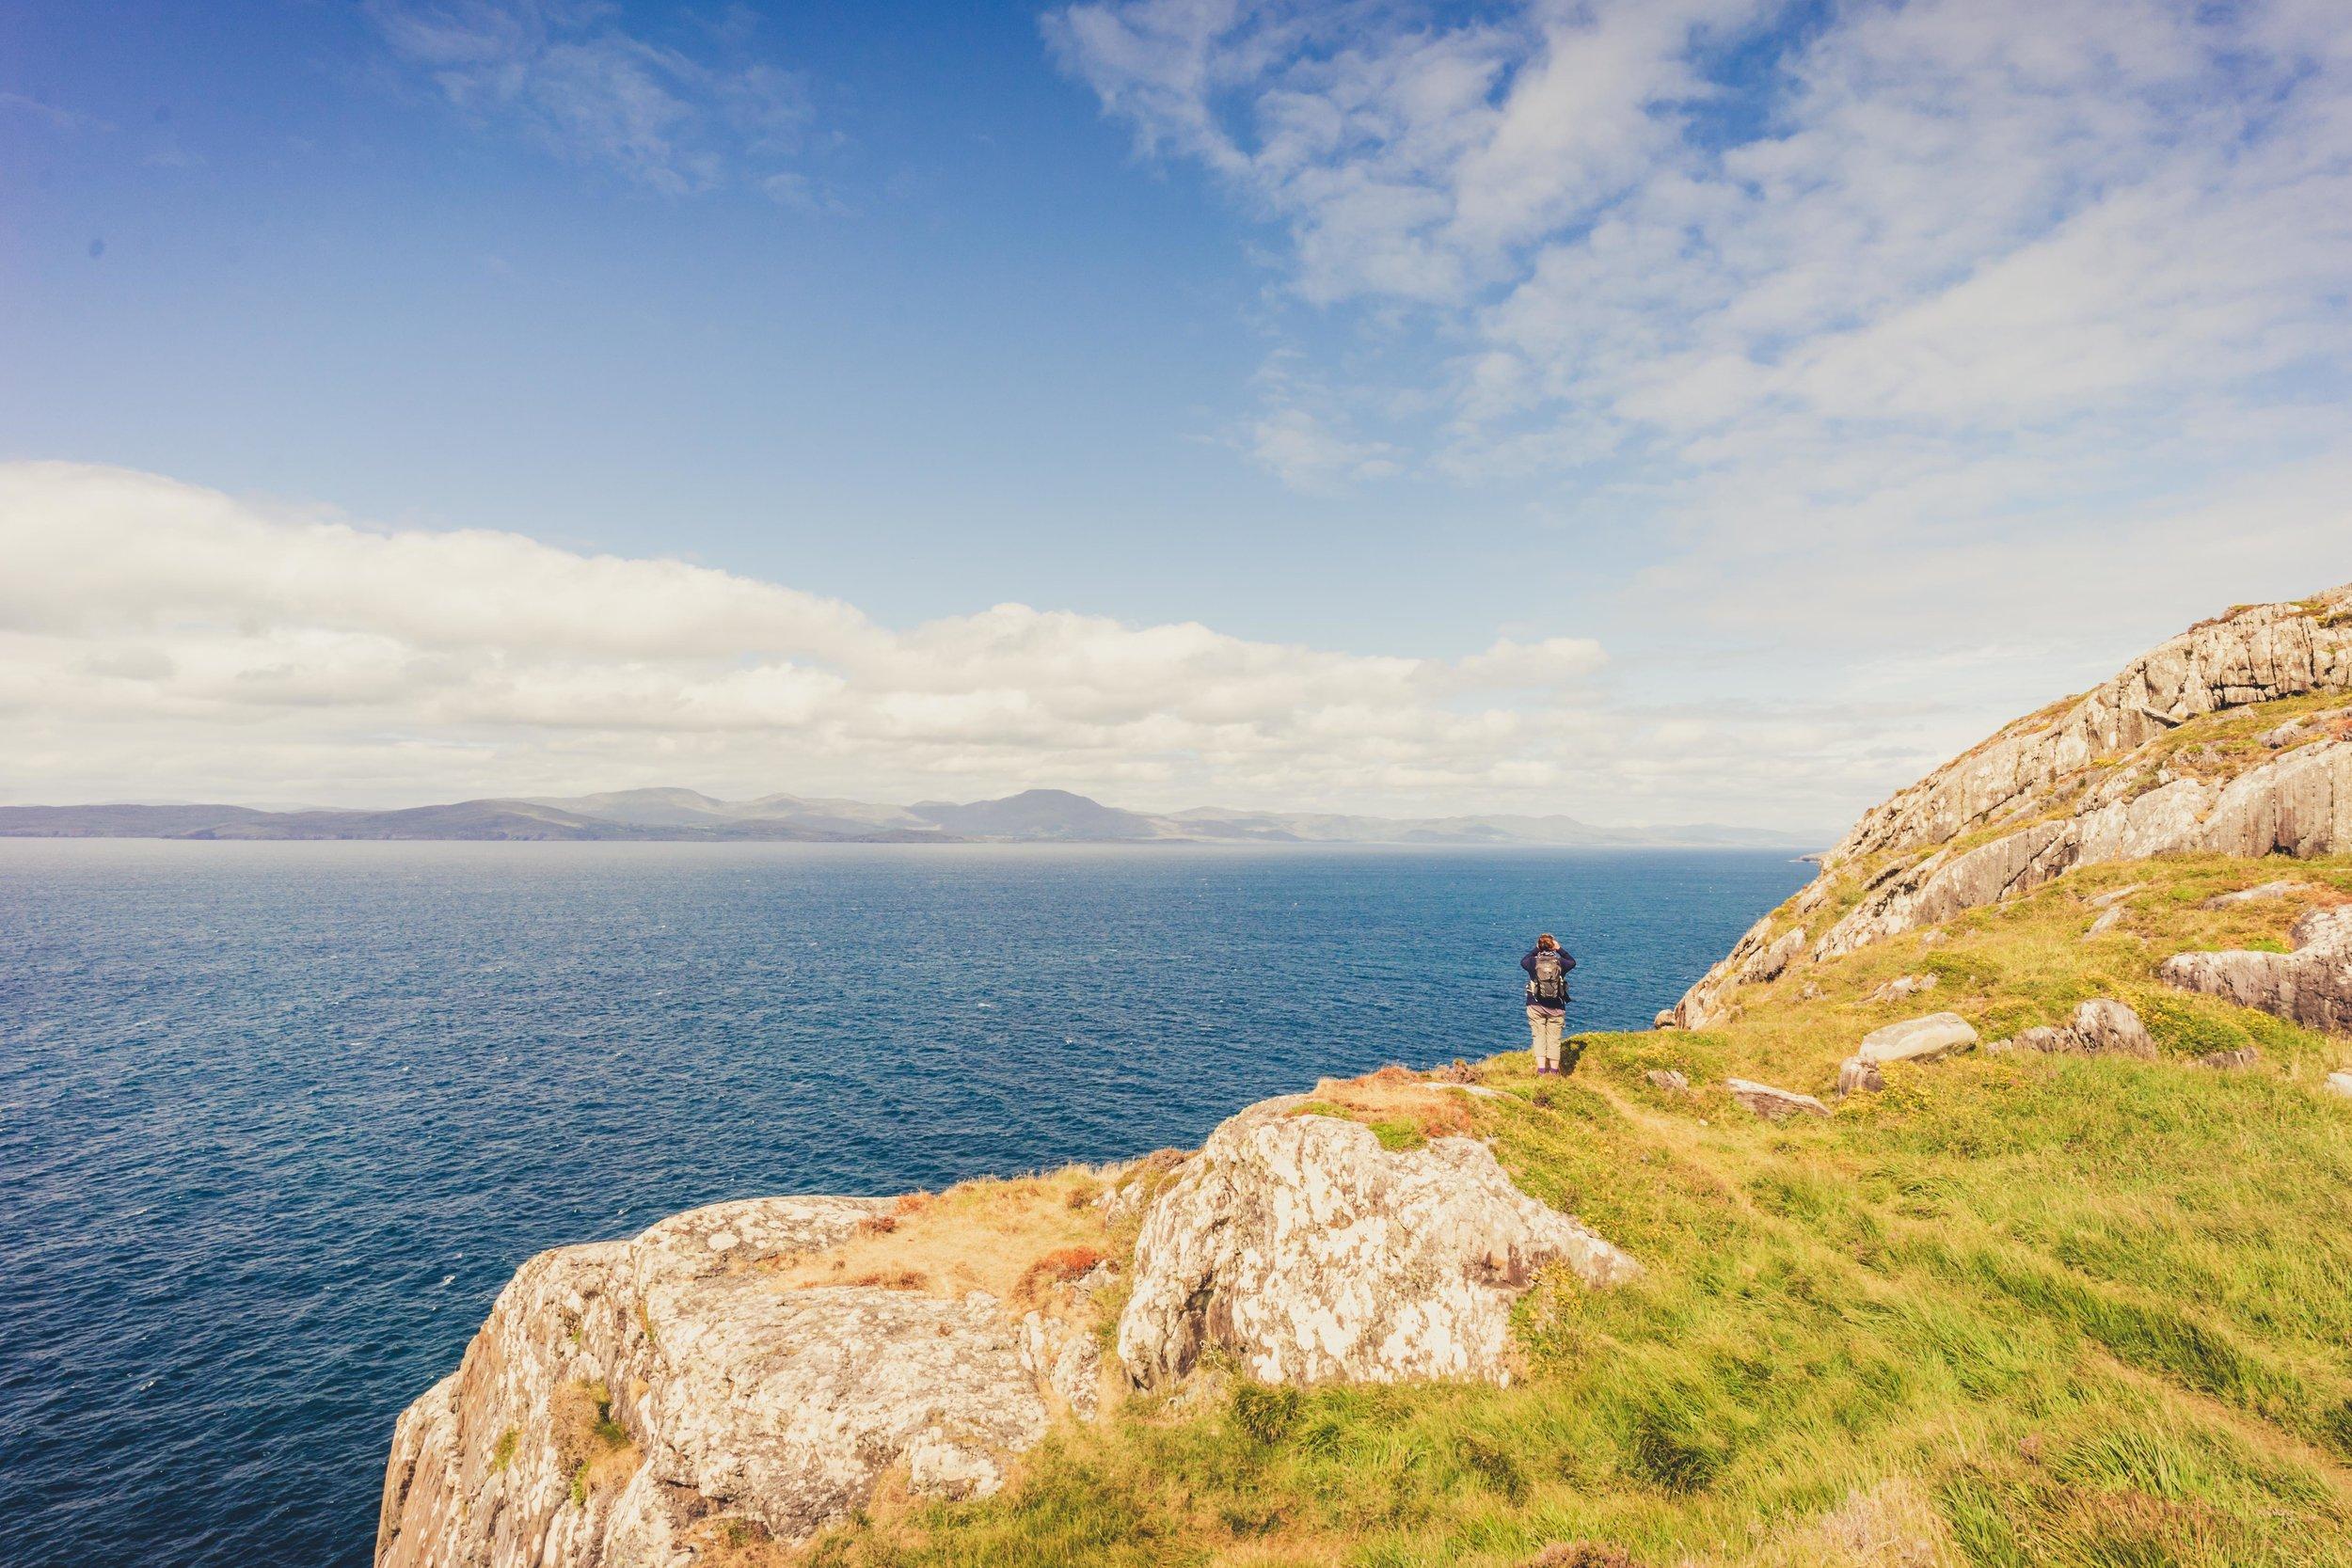 county cork. cork. ireland. irish. history. city. house sitting. old. travel. travel photography. travel photographer. lough hyne. hiking. outdoor. adventure. hiking. camping. hiking on sheeps head.jpg